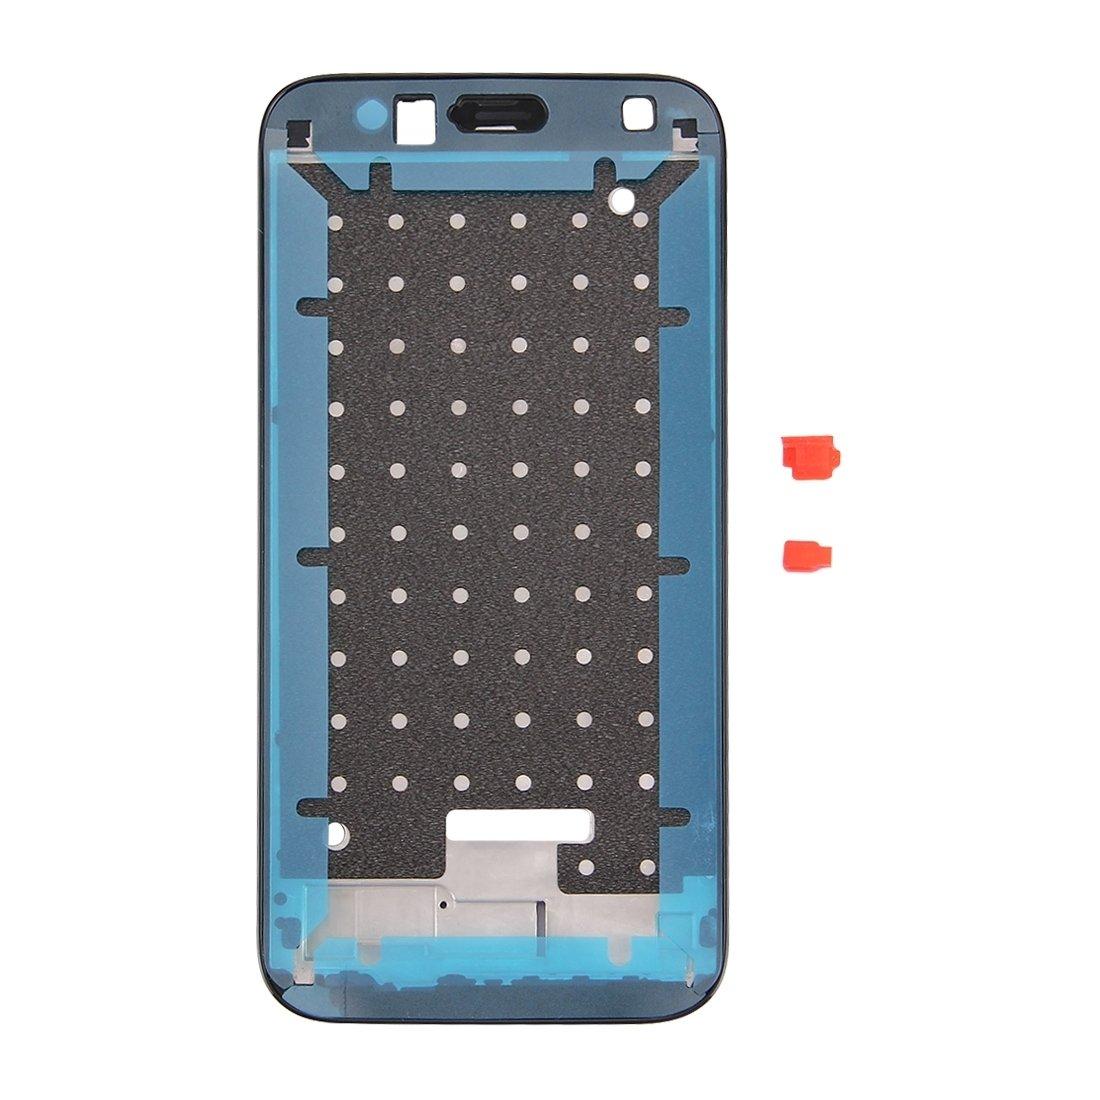 Amazon.com: Reemplazo Pats, ipartsbuy Huawei G8 Carcasa ...